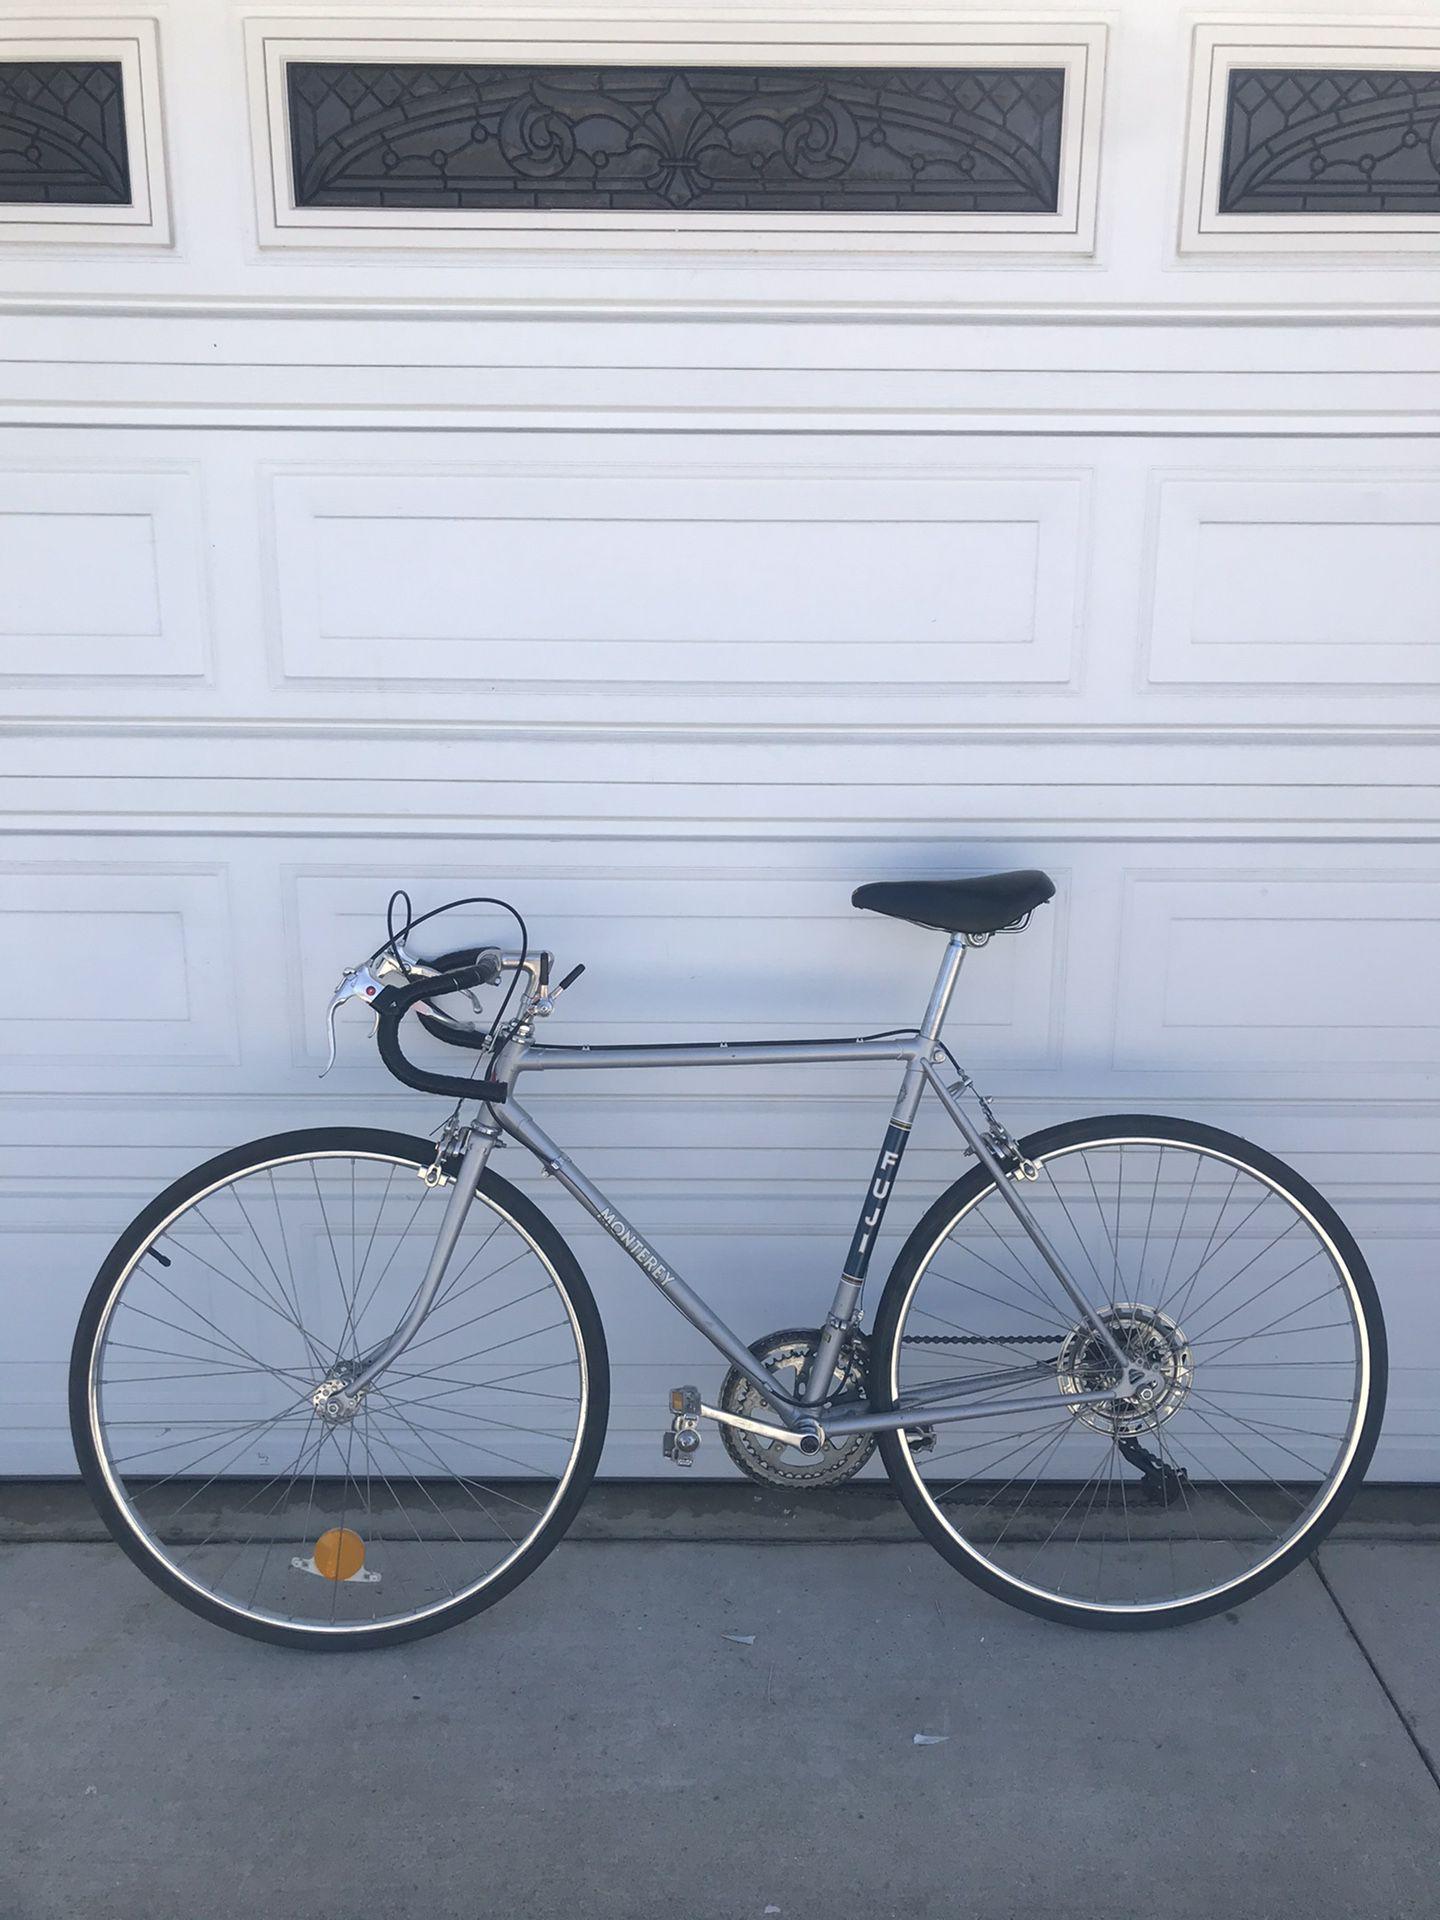 1981 Fuji Monterey Road Bike 10 Speed